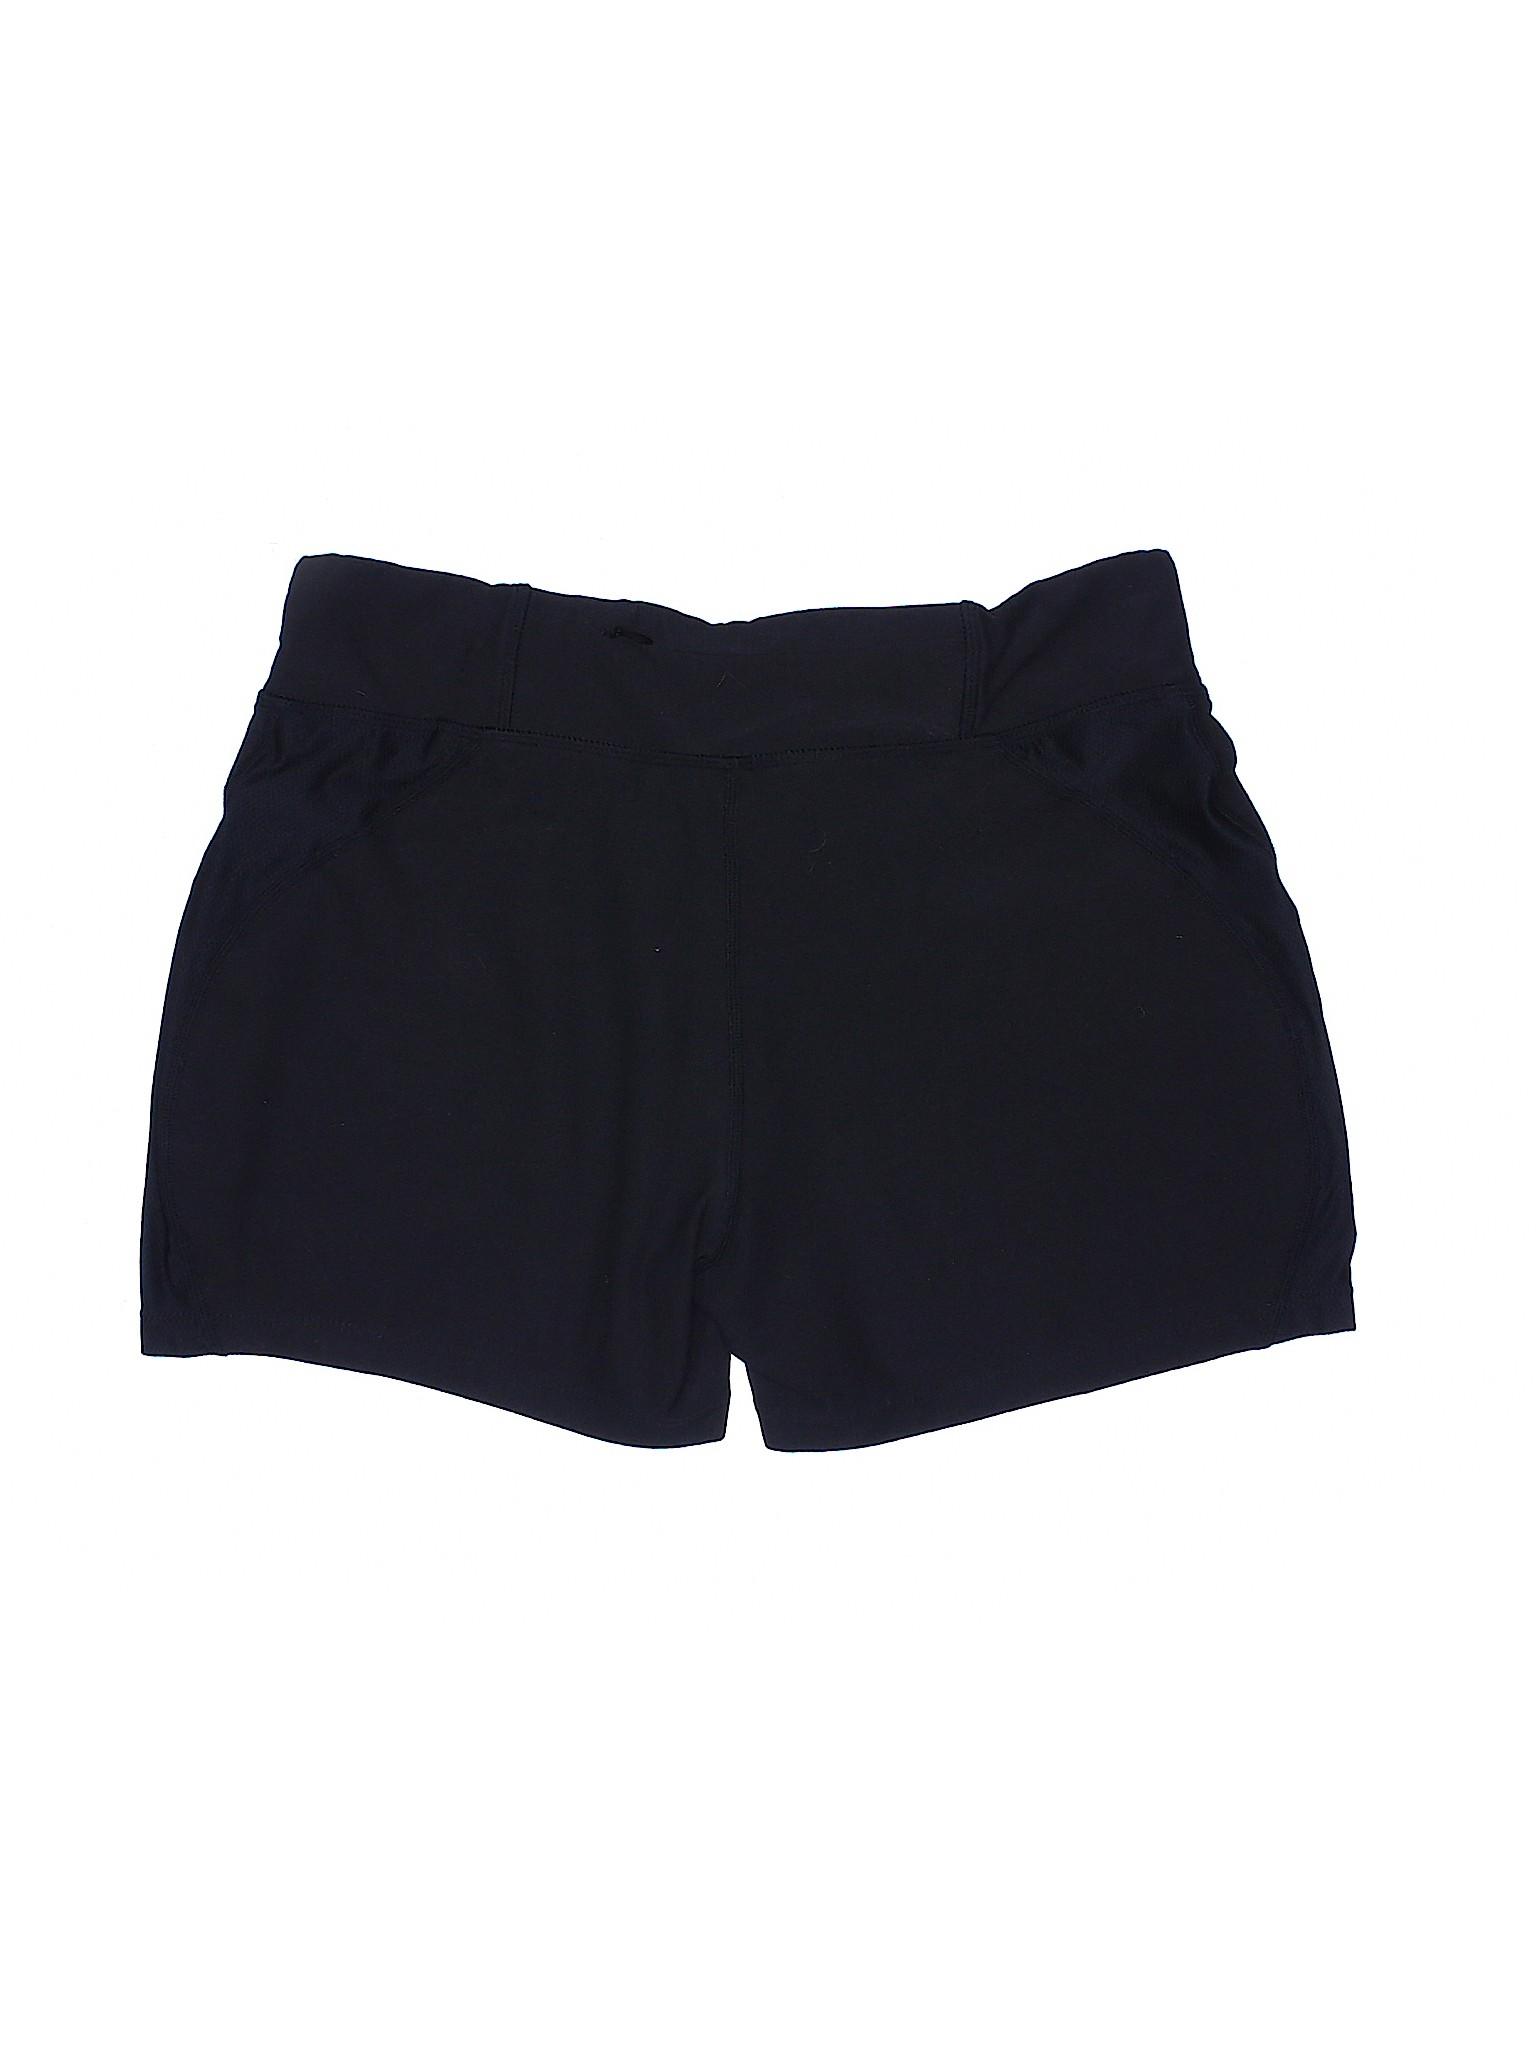 Boutique MPG Athletic Boutique MPG Shorts gwdPO